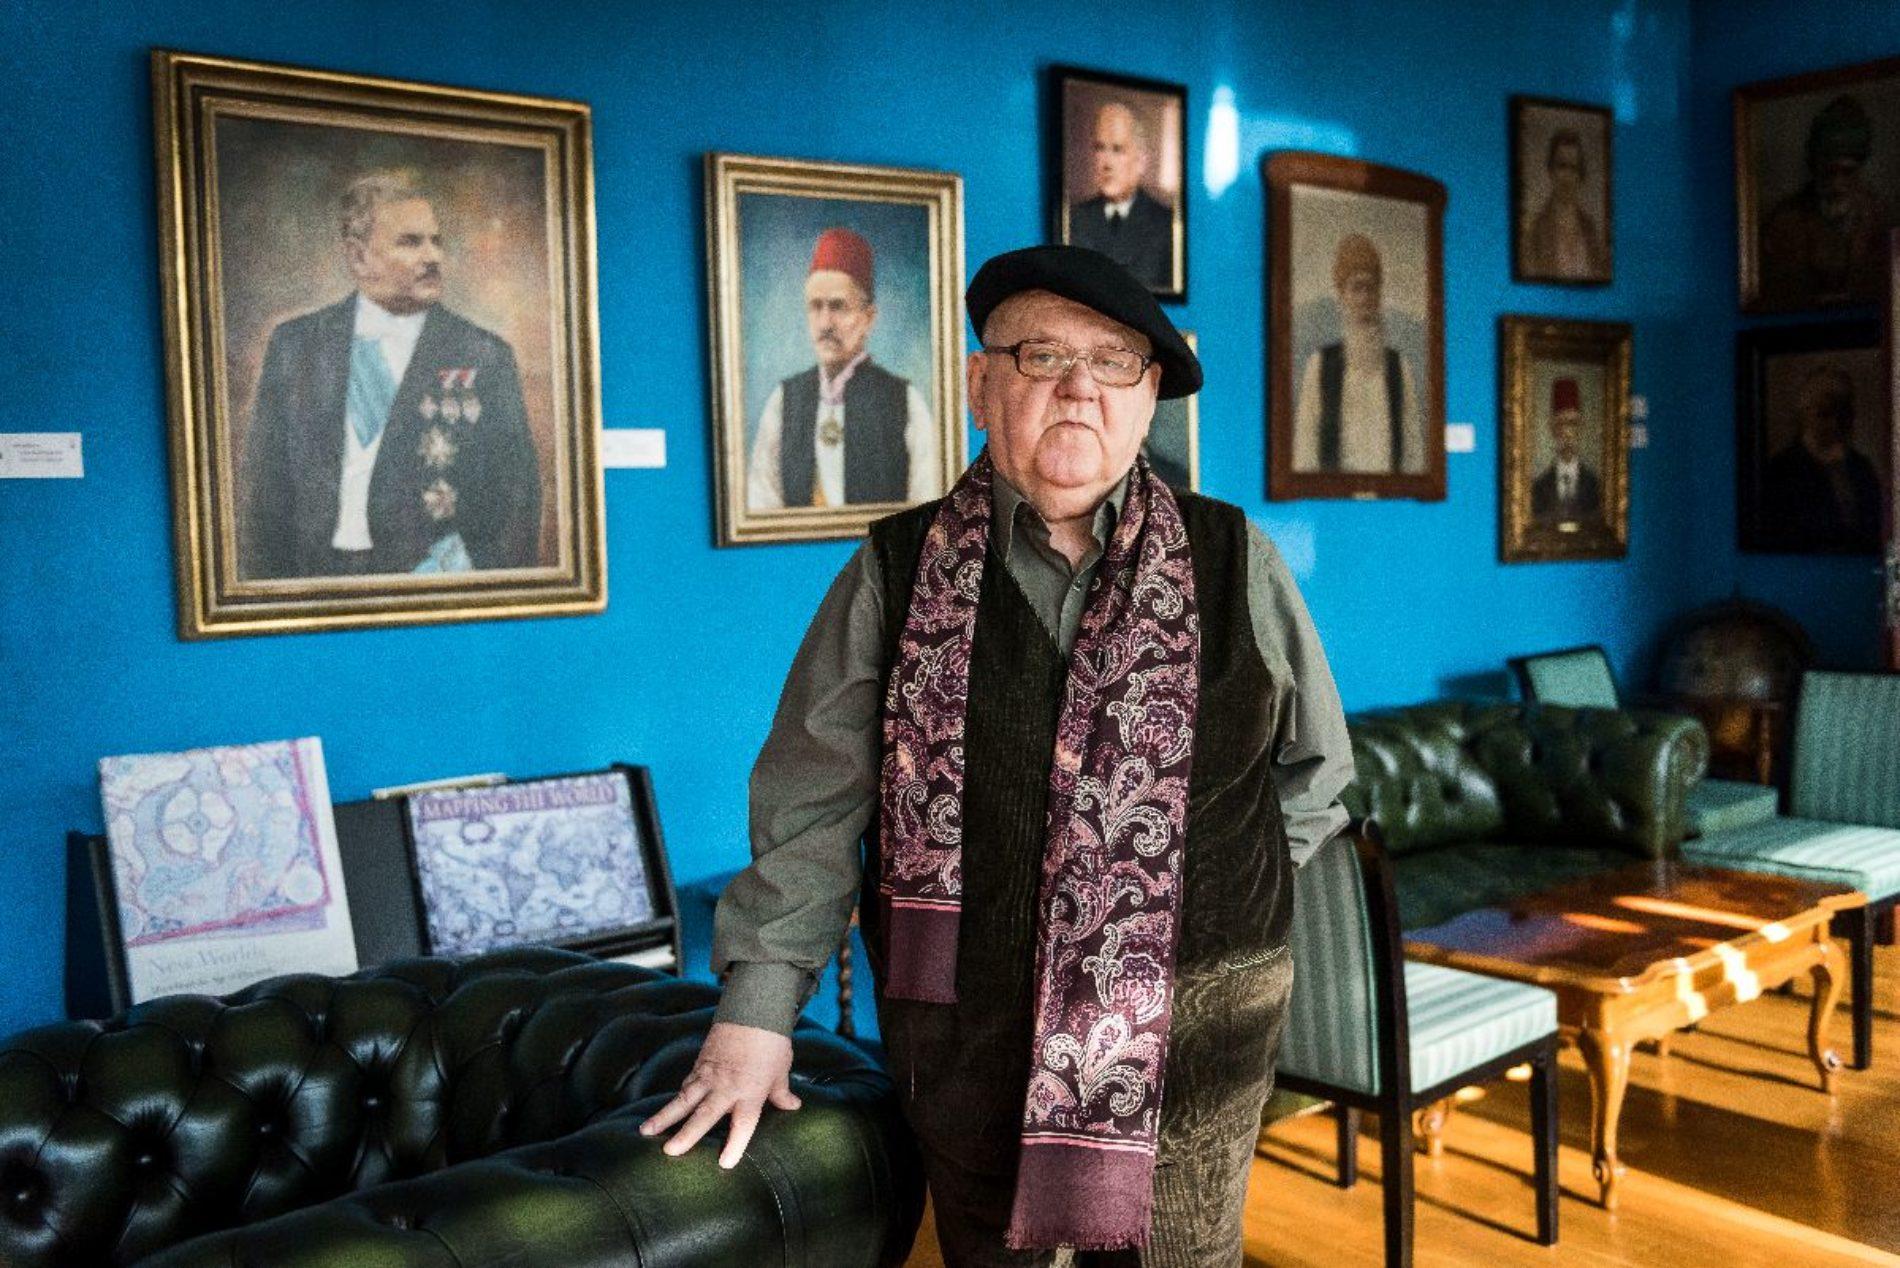 Abdulah Sidran, akademik i književnik: Historija Bosne je historija otimanja za Bosnu